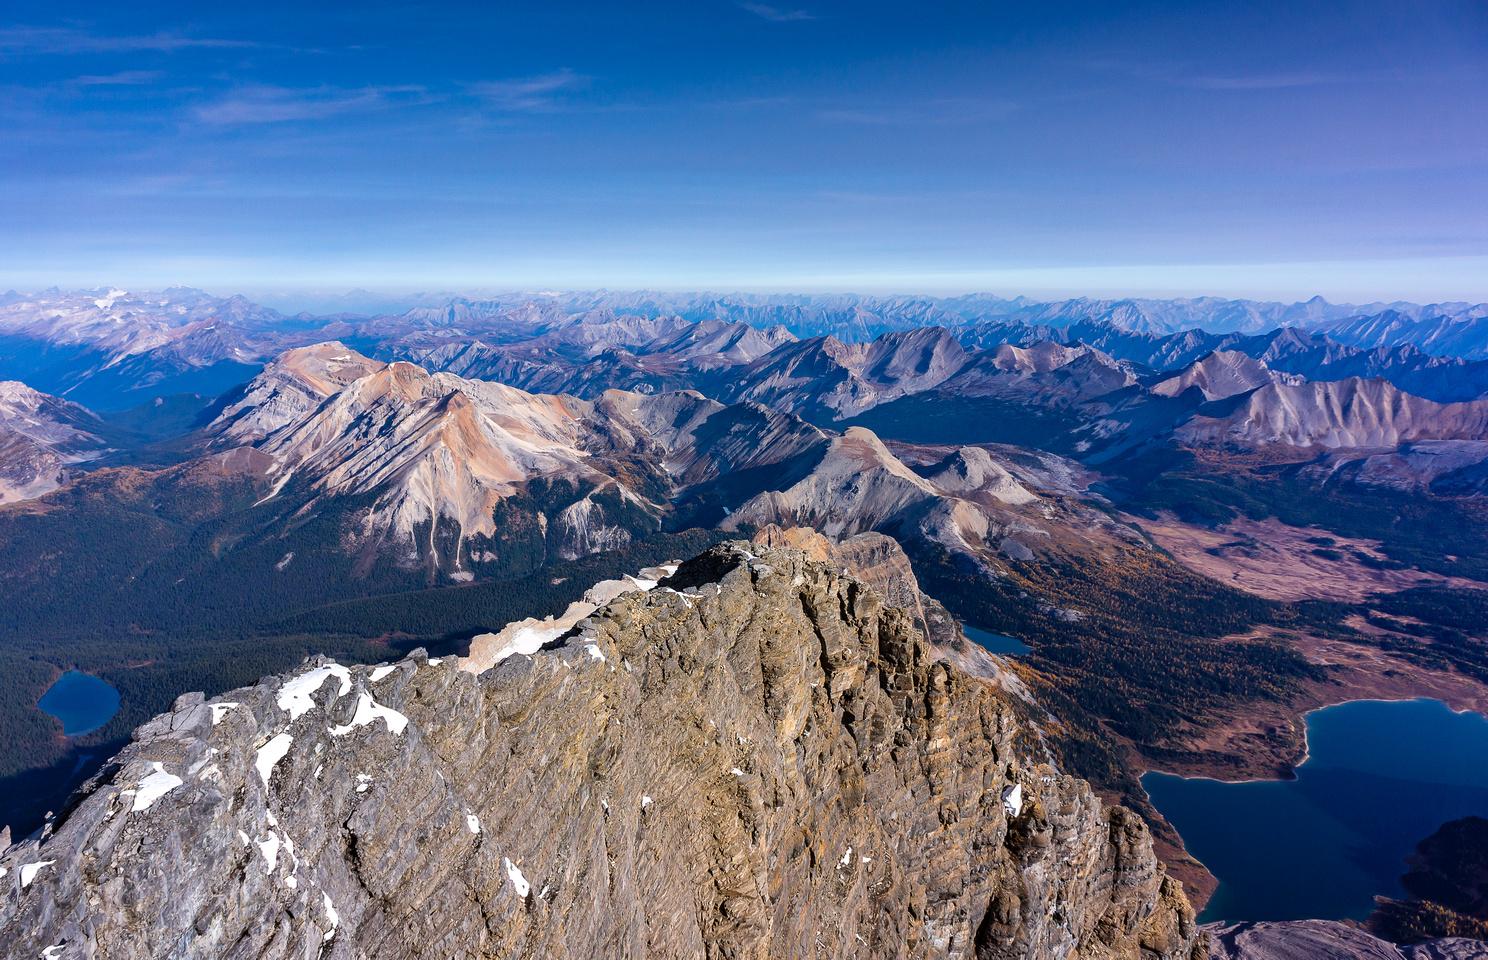 The Simpson Ridge runs from Nub Peak at center over Nestor and Simpson Peak to the ridge at left.